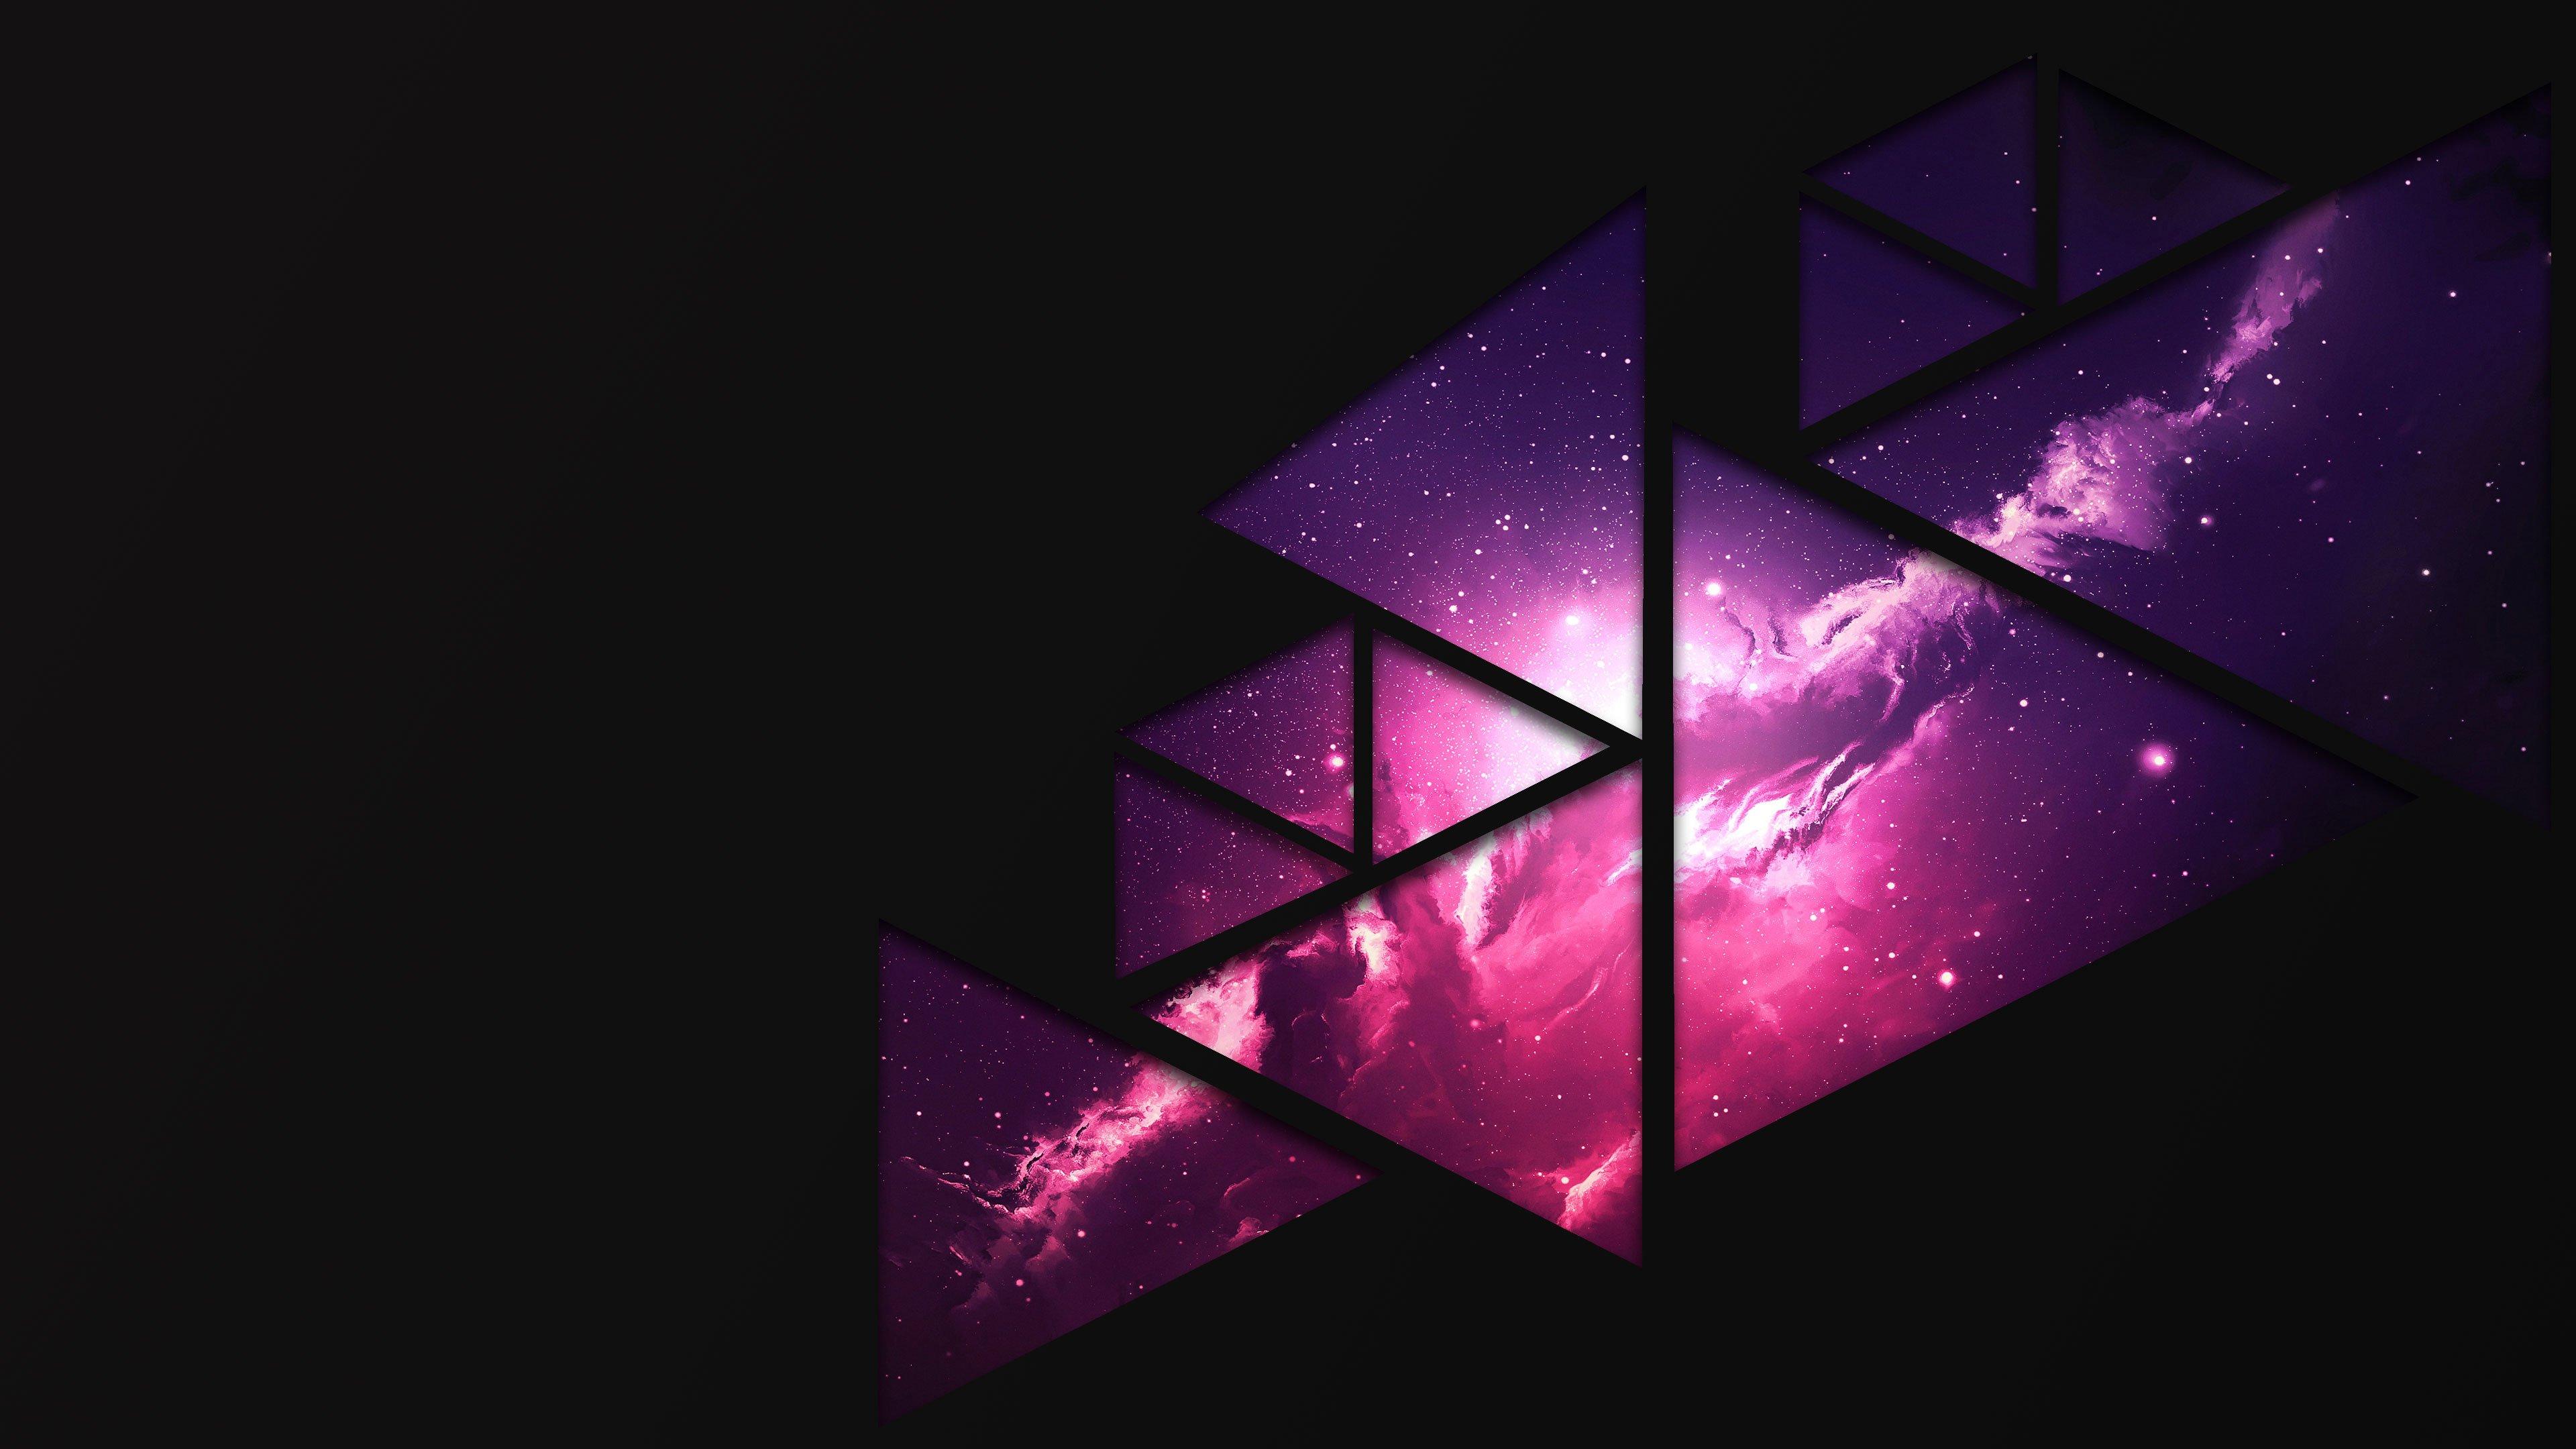 space wallpaper 4k,purple,violet,light,triangle,graphic design